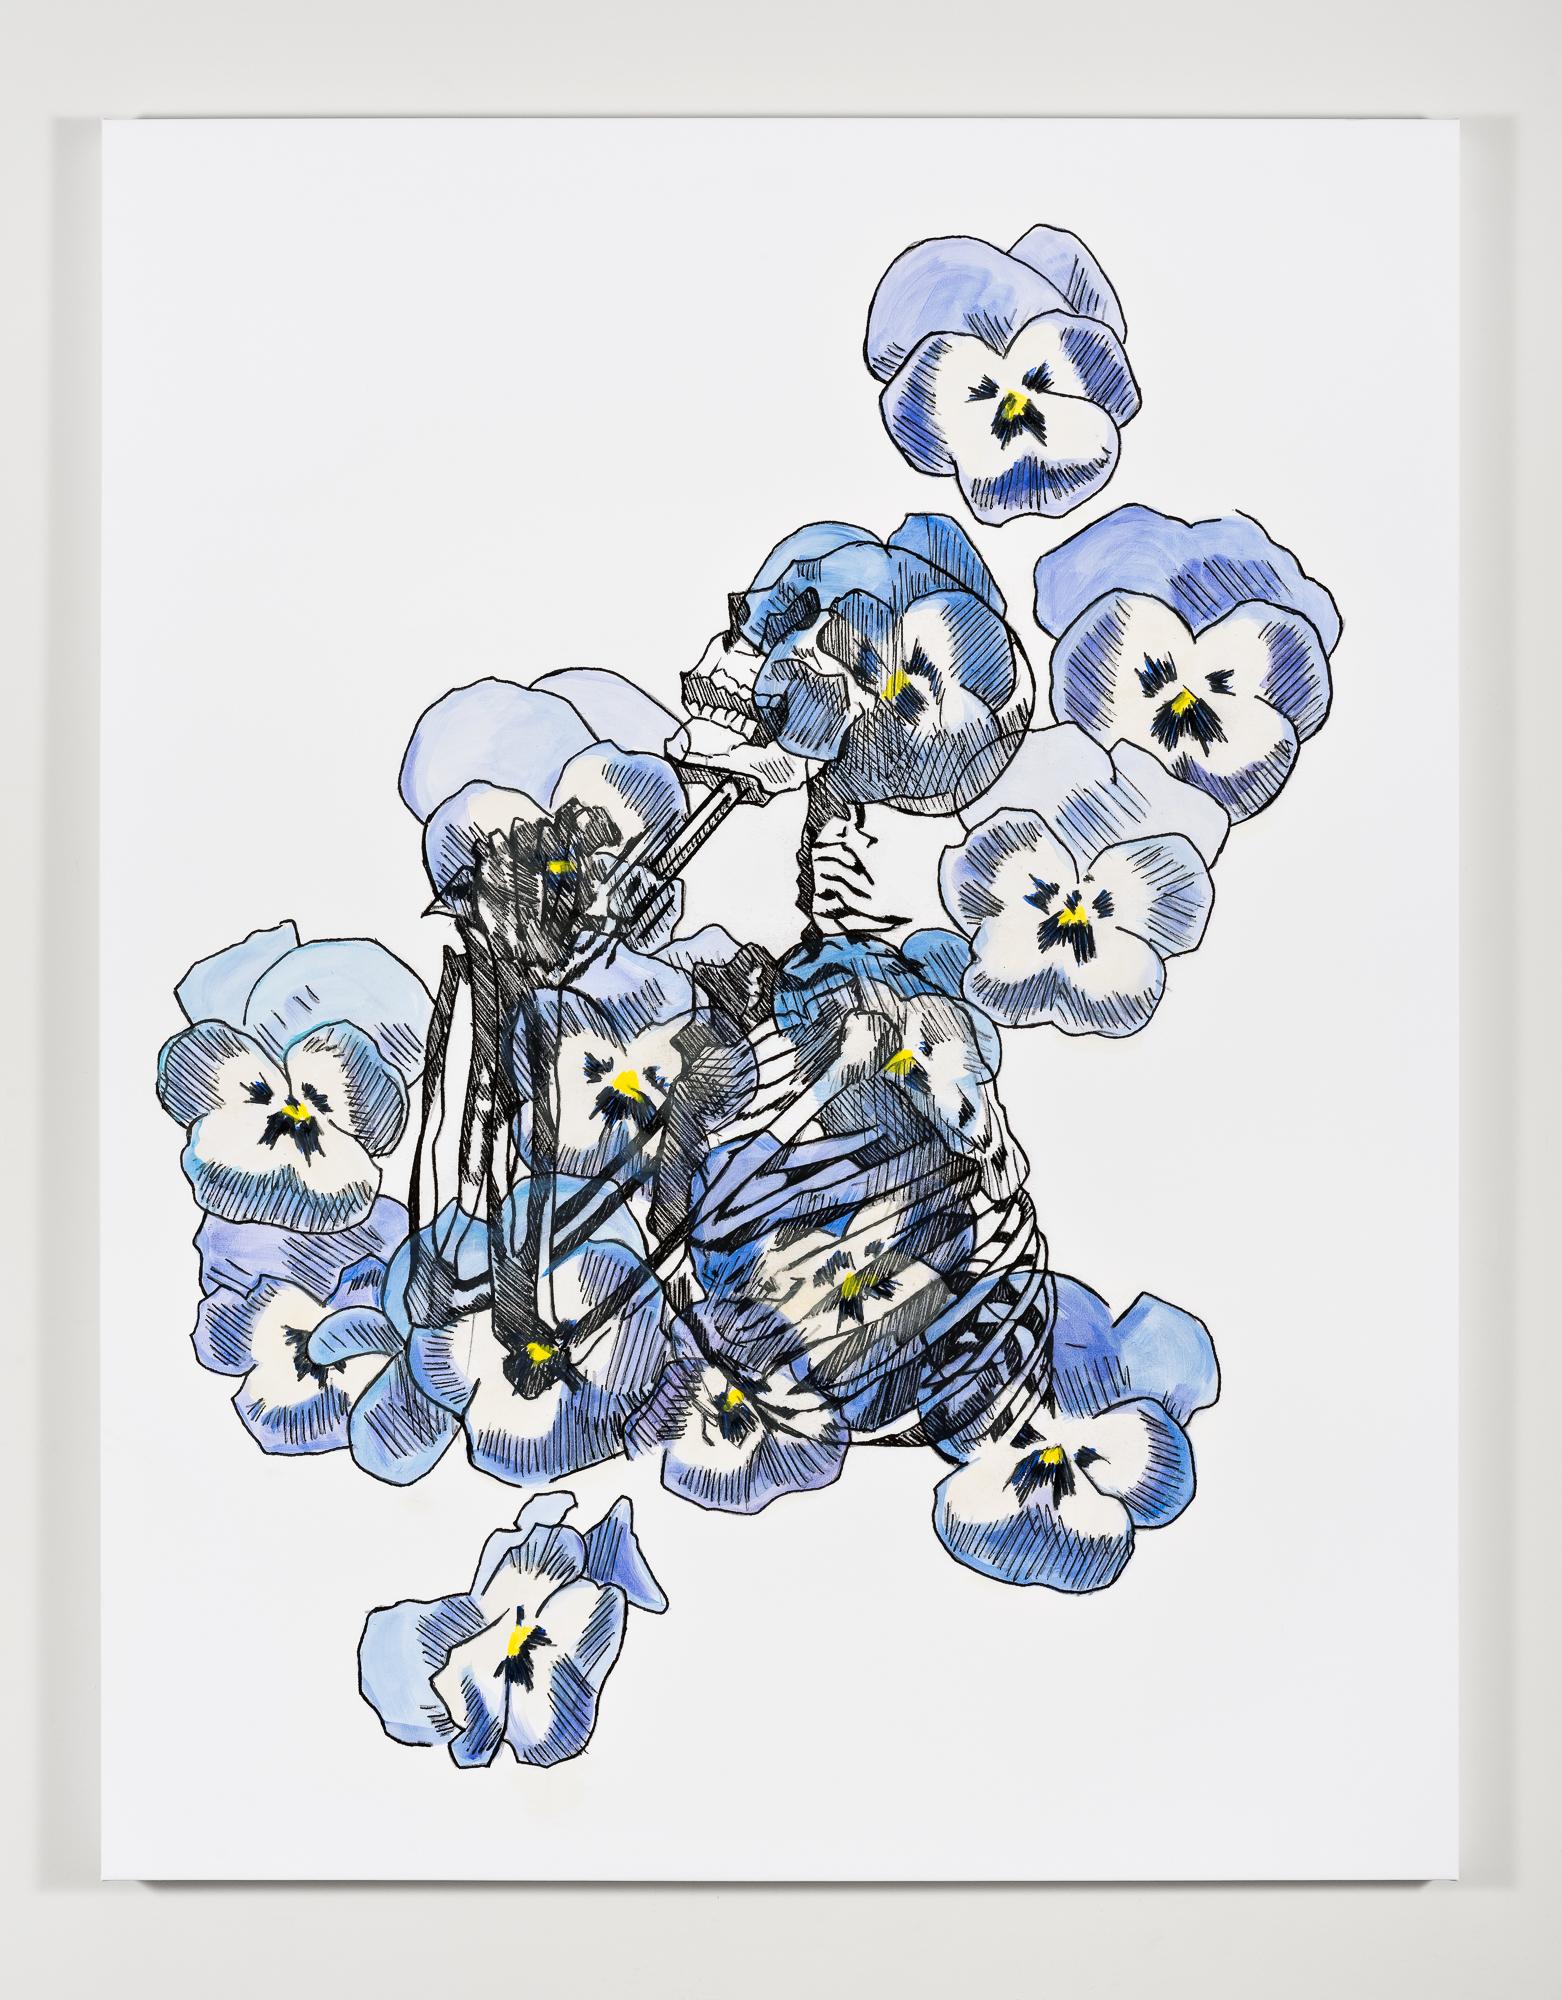 2019_03 - Mieke Marple-16.jpg